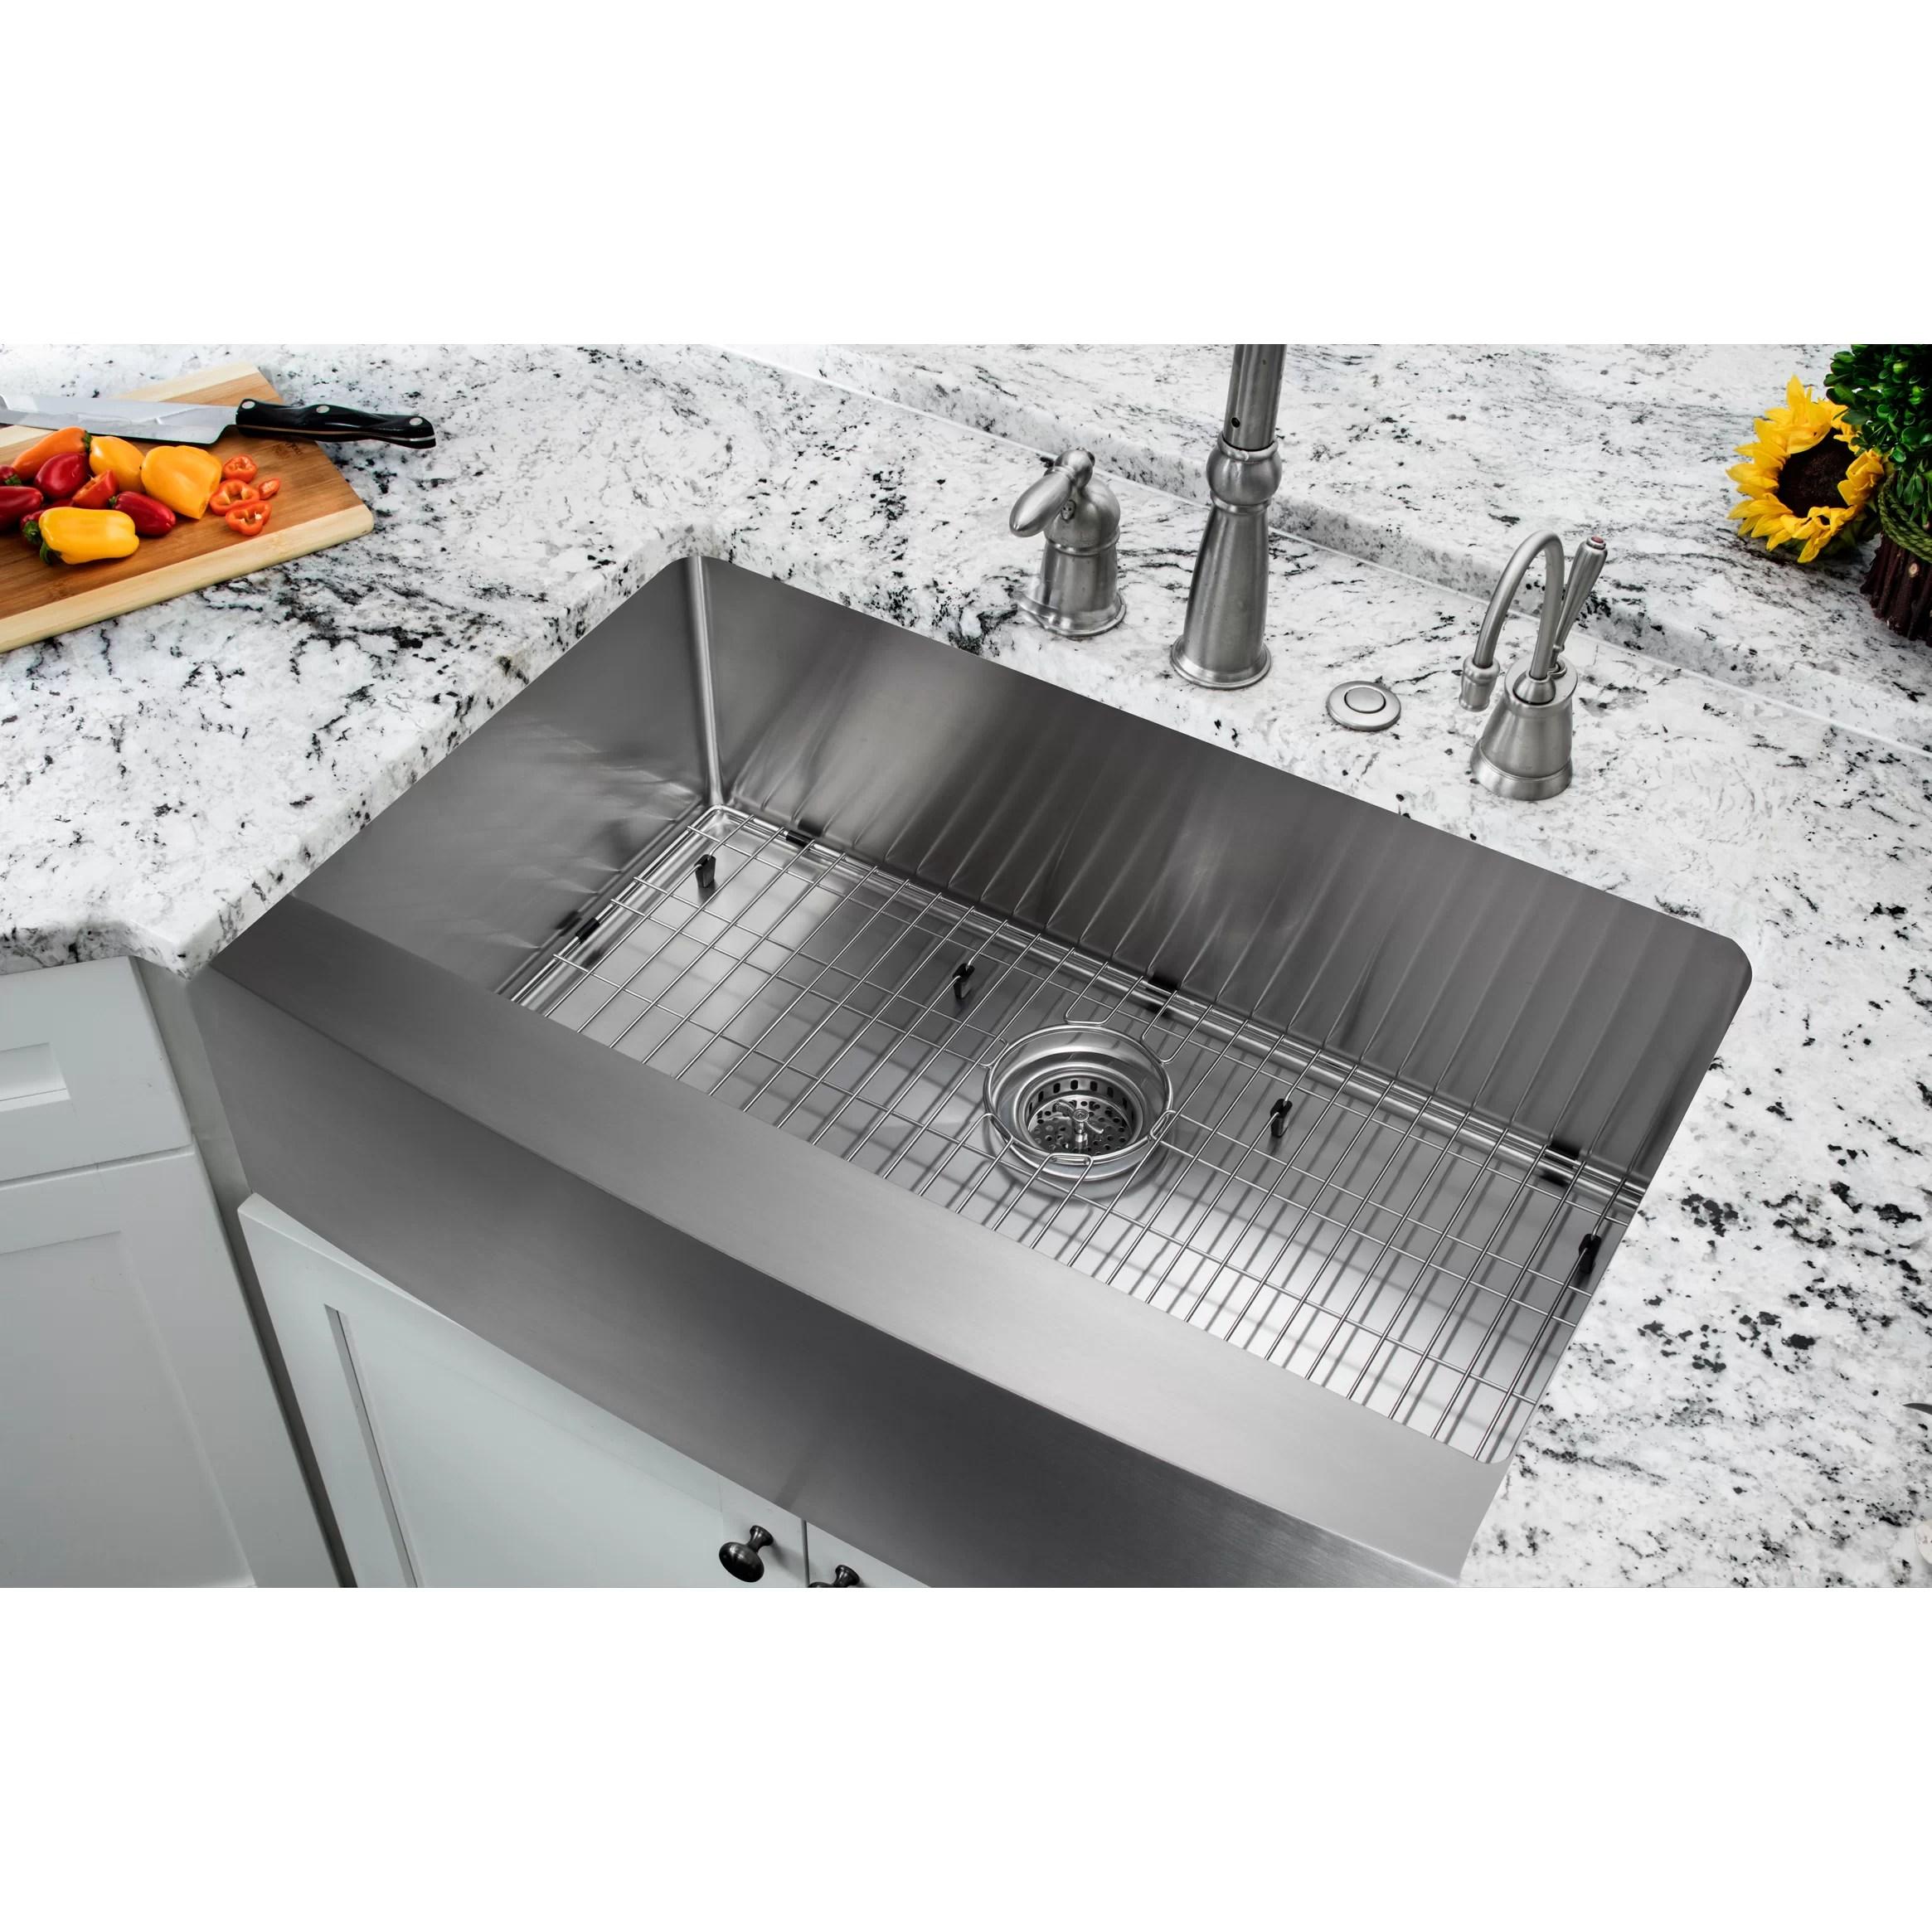 All Kitchen Sinks l c O~Farmhouse+ 5BS 5D+Apron farm kitchen sink 35 20 75 Single Bowl Farmhouse Apron Kitchen Sink